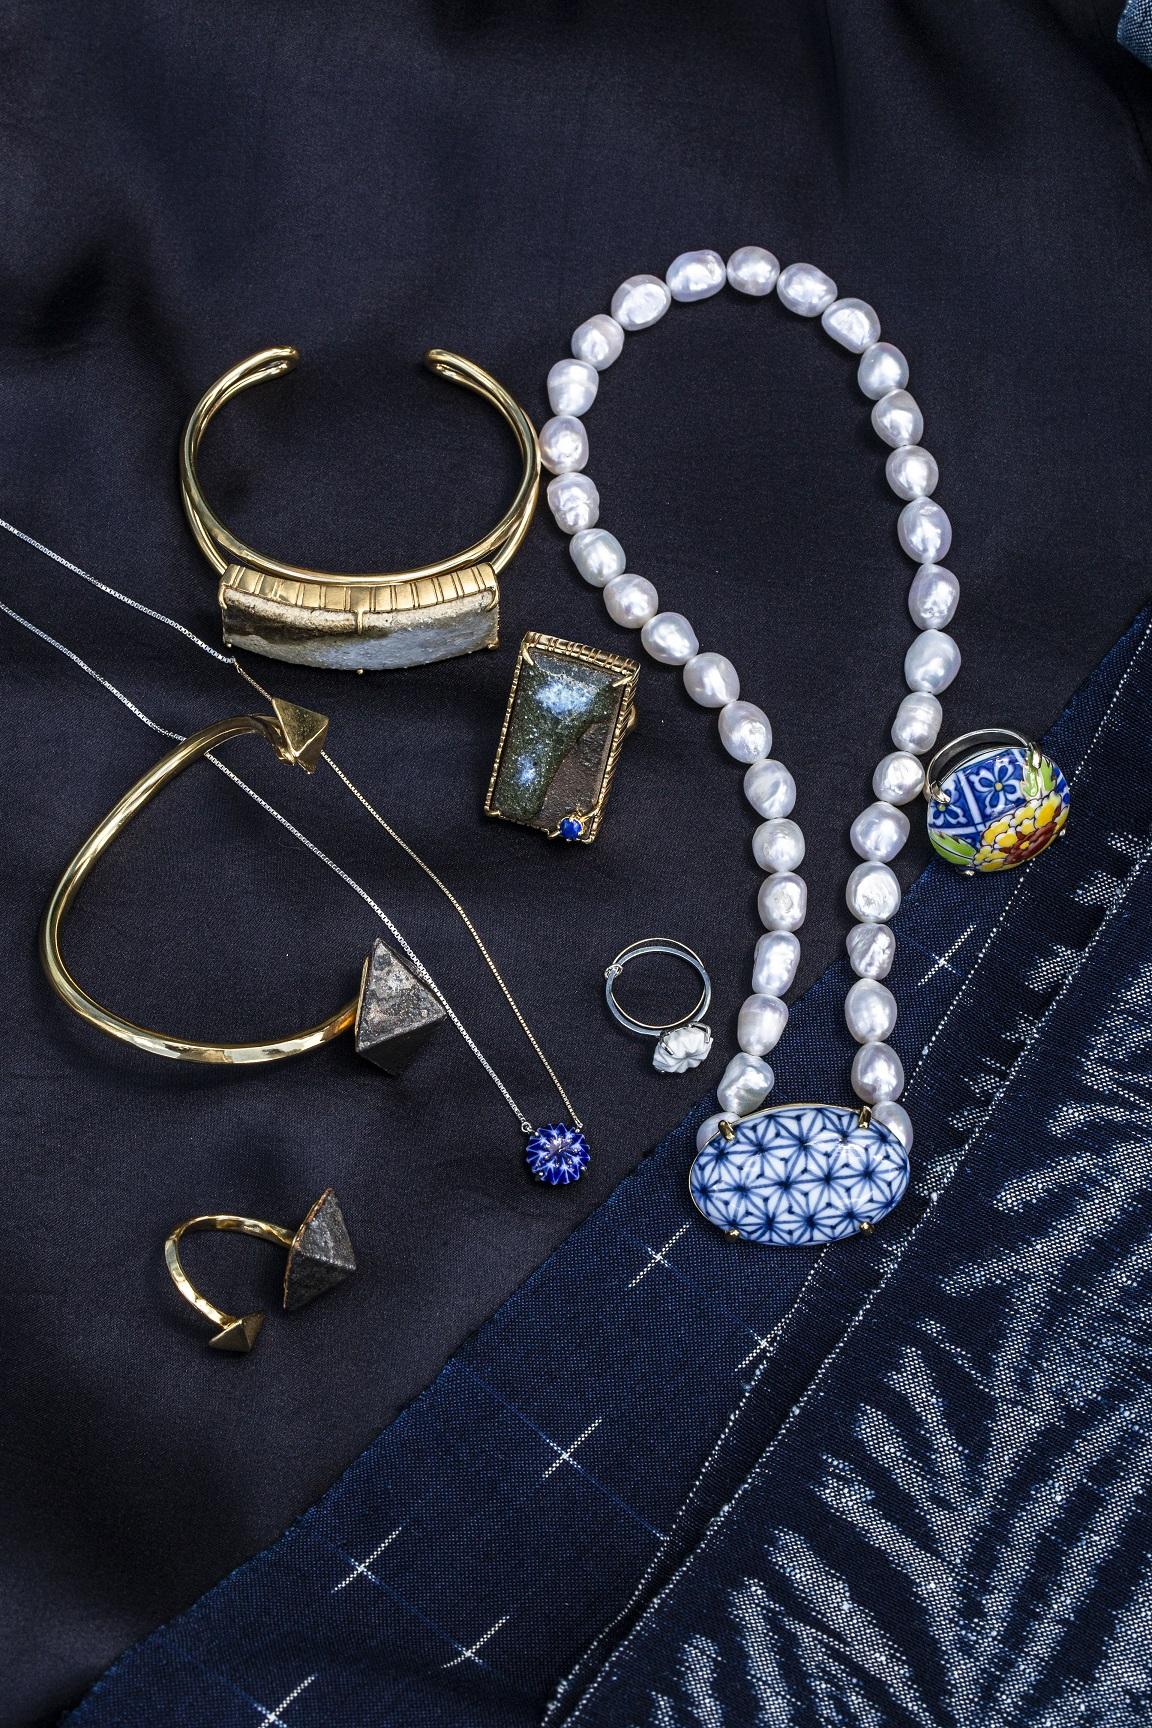 HIZEN jewelry